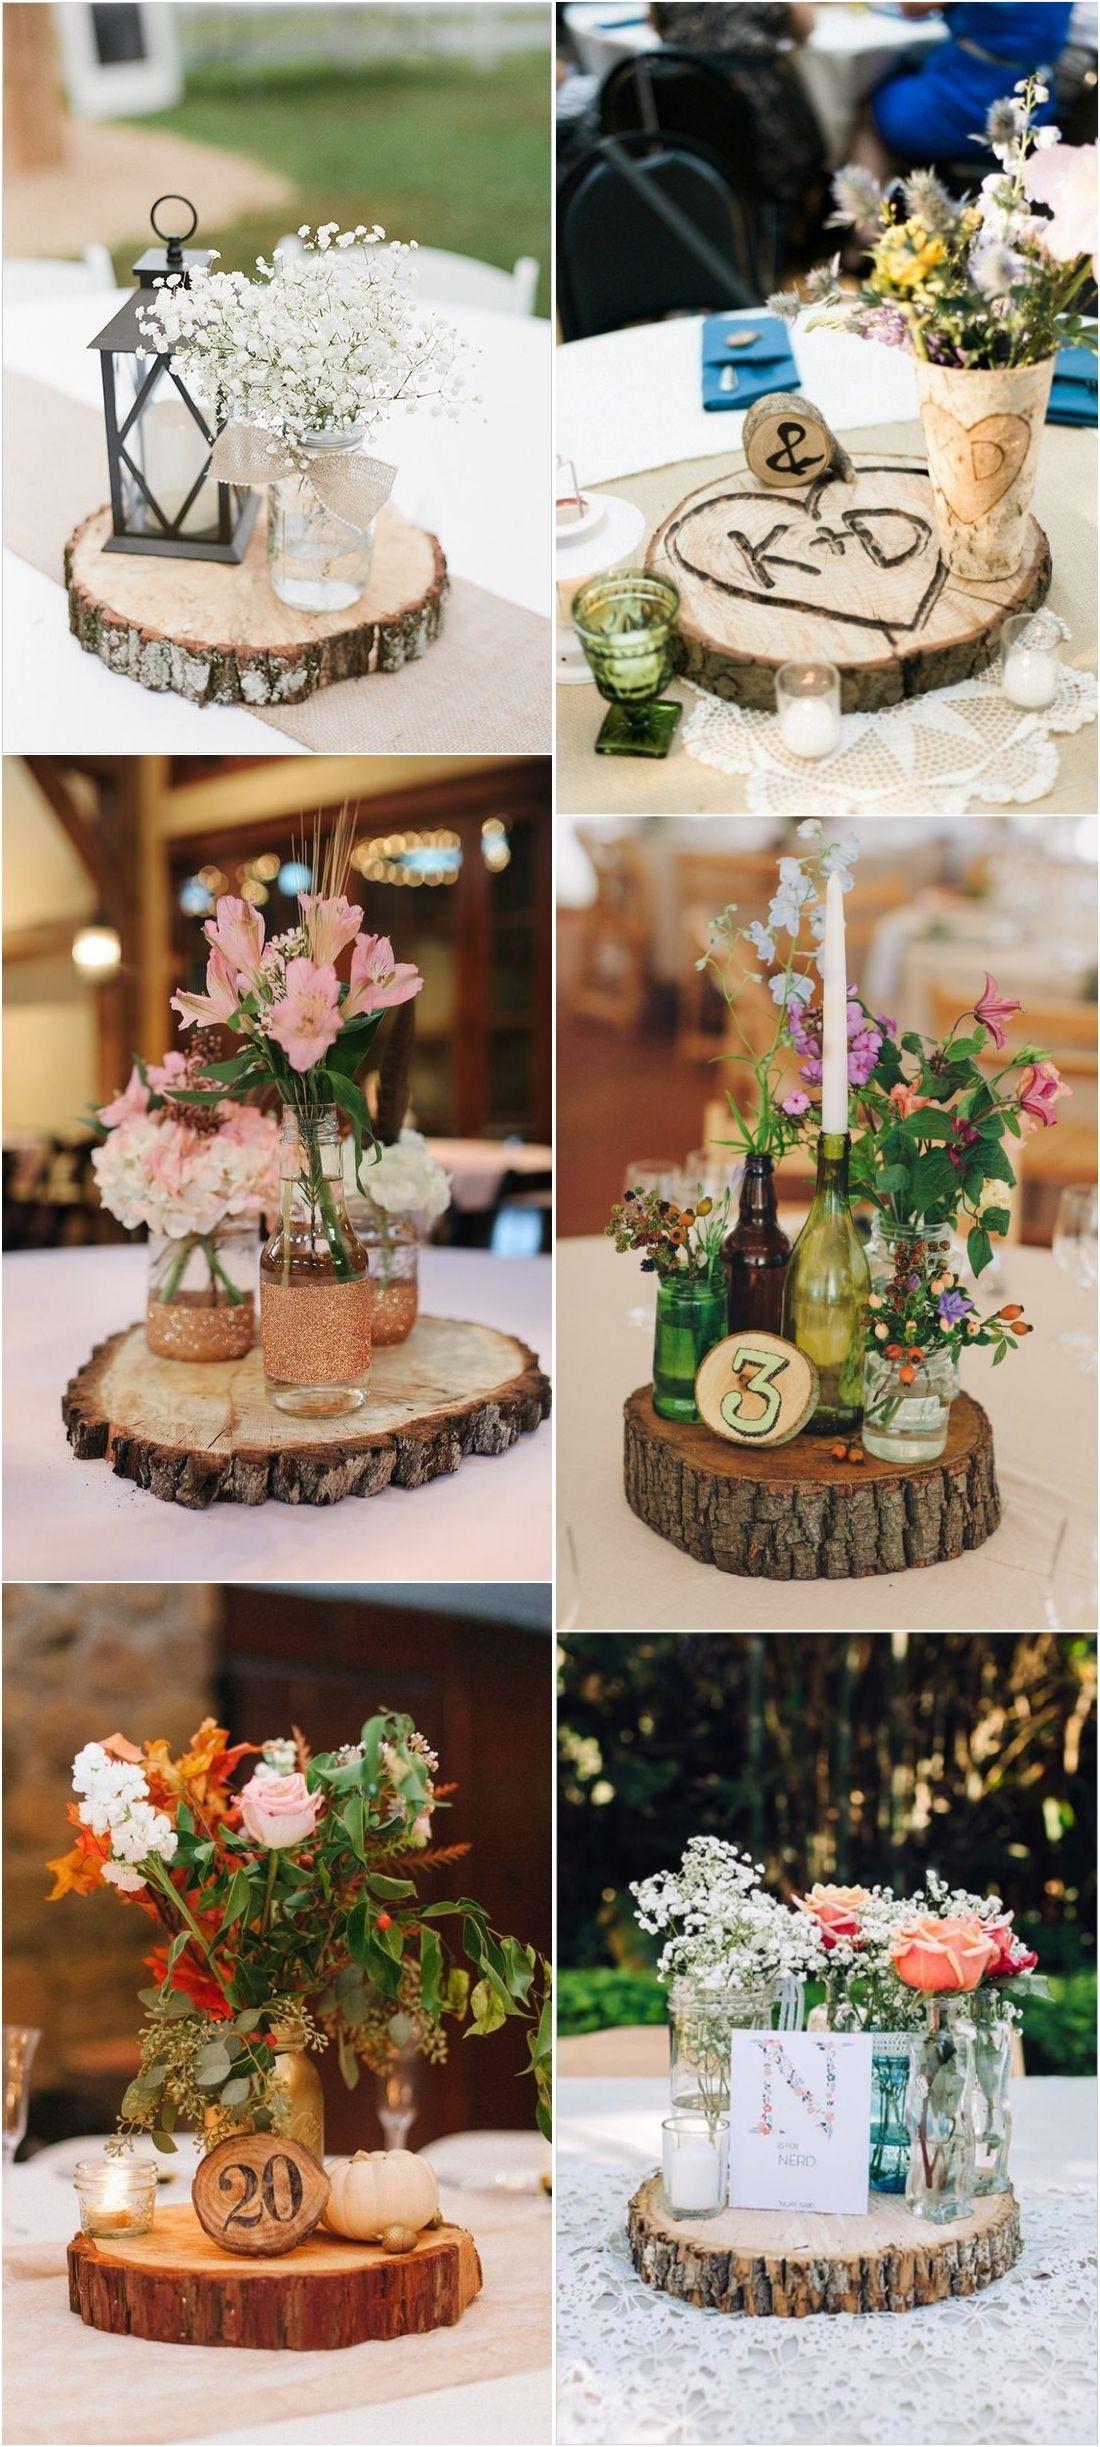 Rustic Woodsy Wedding Trend 2018 Tree Stump Woodsy Wedding